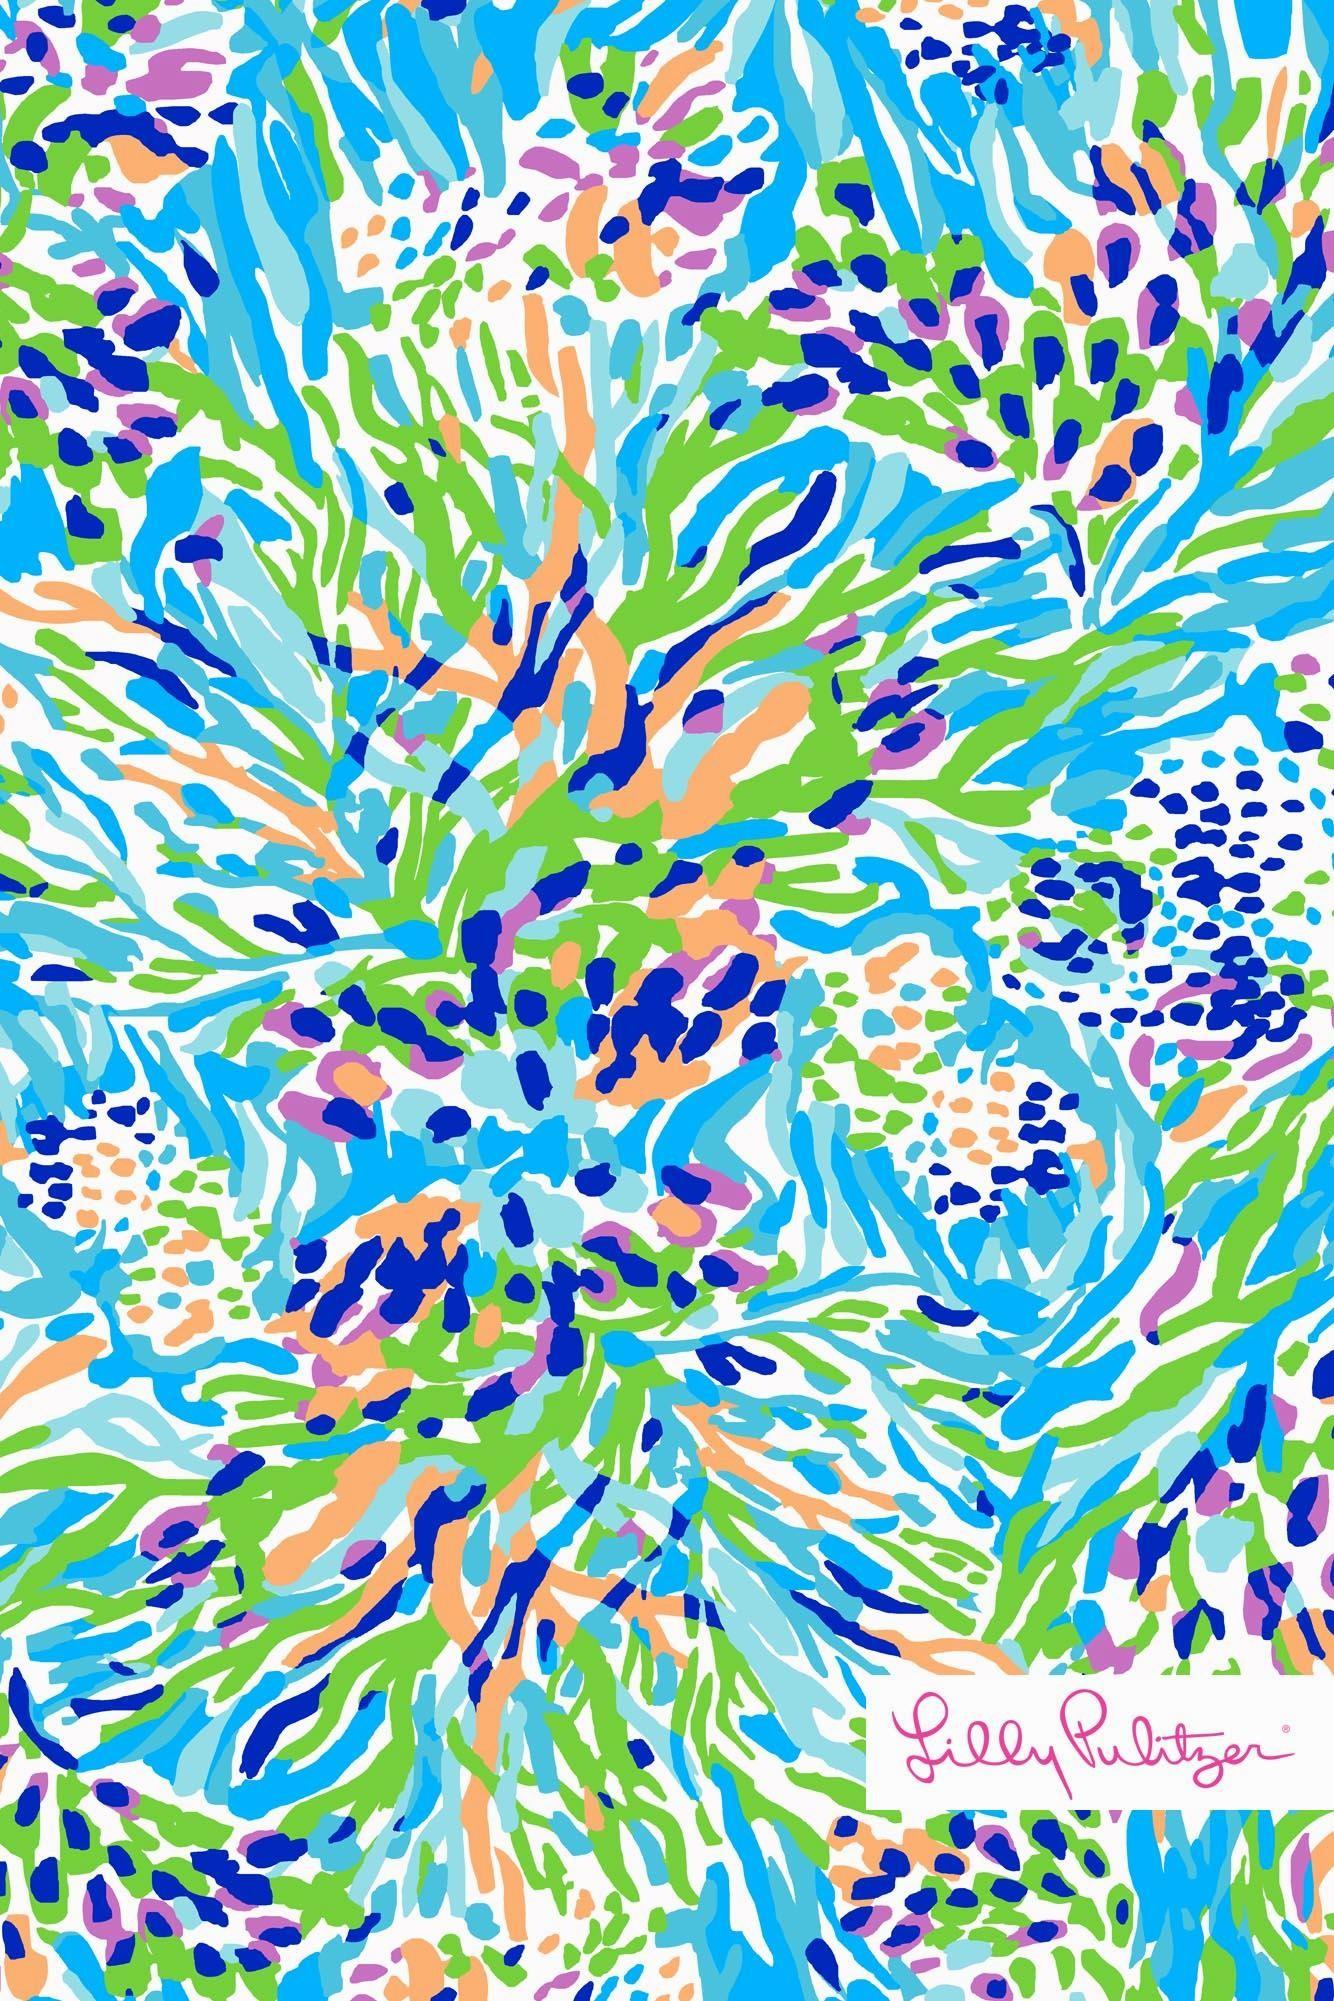 Lilly-Pulitzer-Sea-Soiree-Print-iphone-wallpaper-wallpaper-